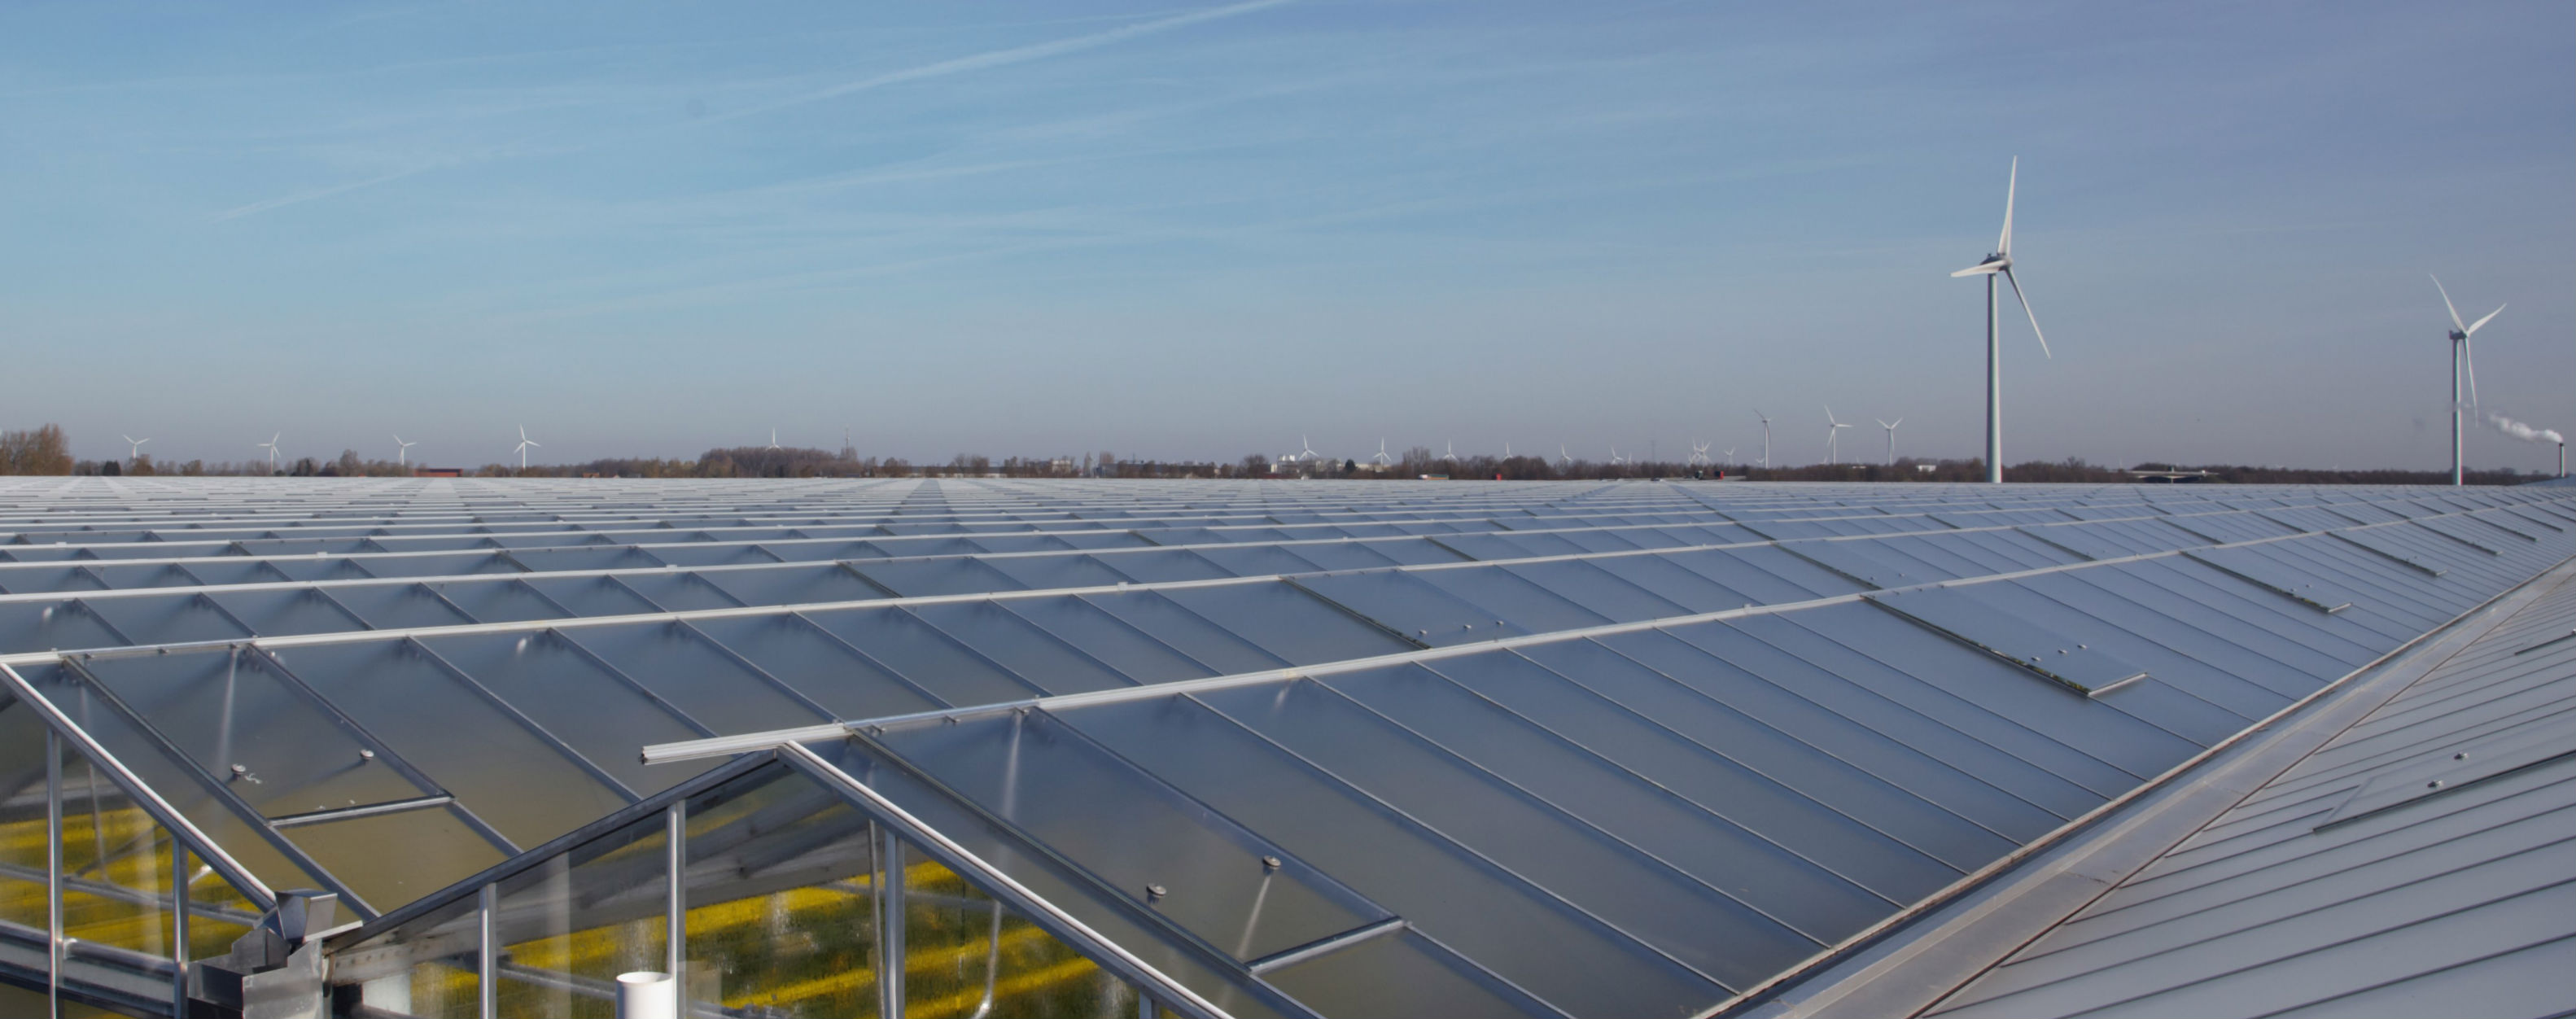 Venlo greenhouse roof system | Alcomij